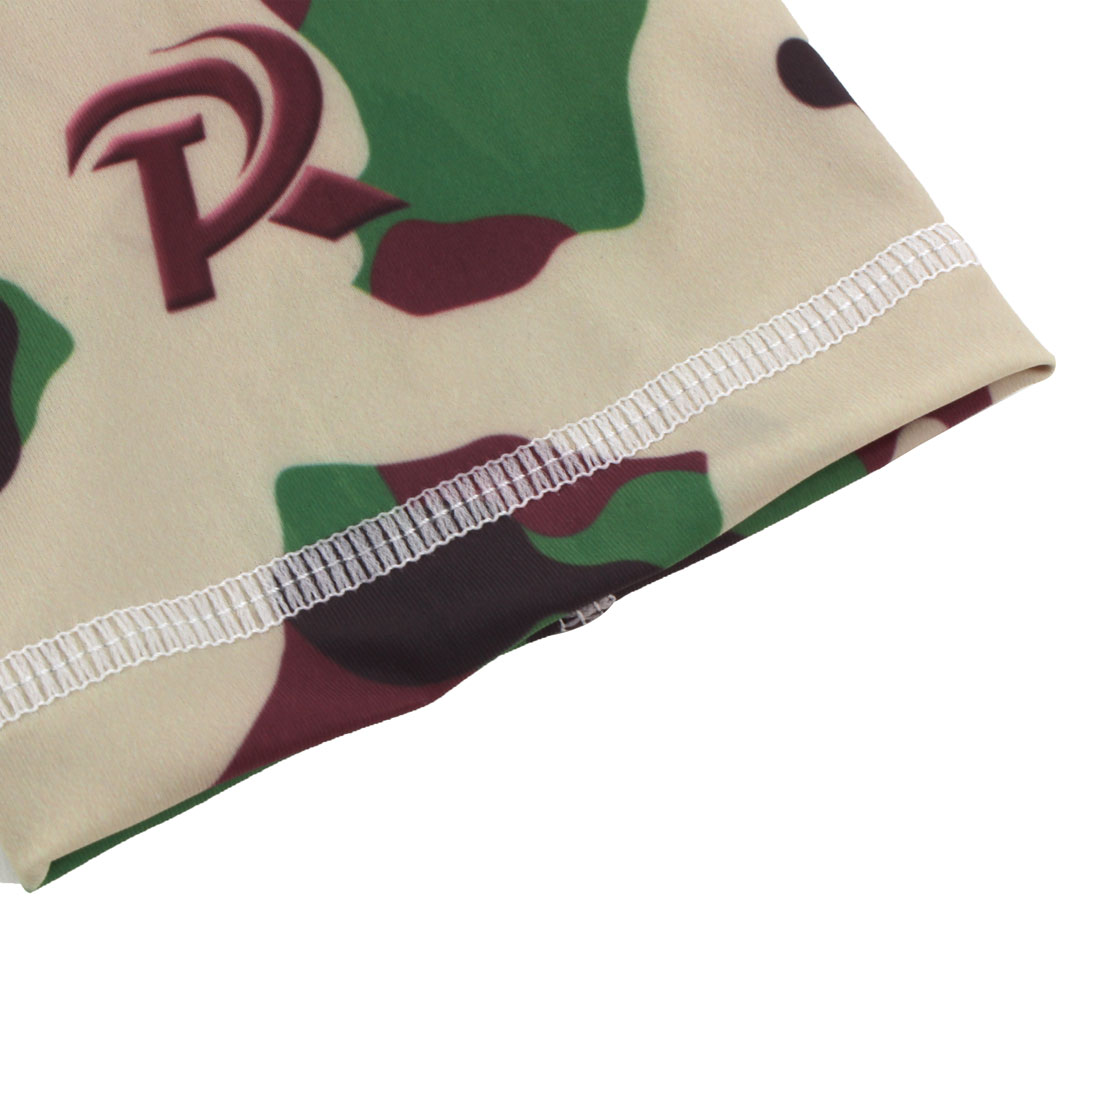 Basketball Patella Knee Brace Leg Sleeve Wrap Support Camouflage Green XL Pair - image 2 de 6